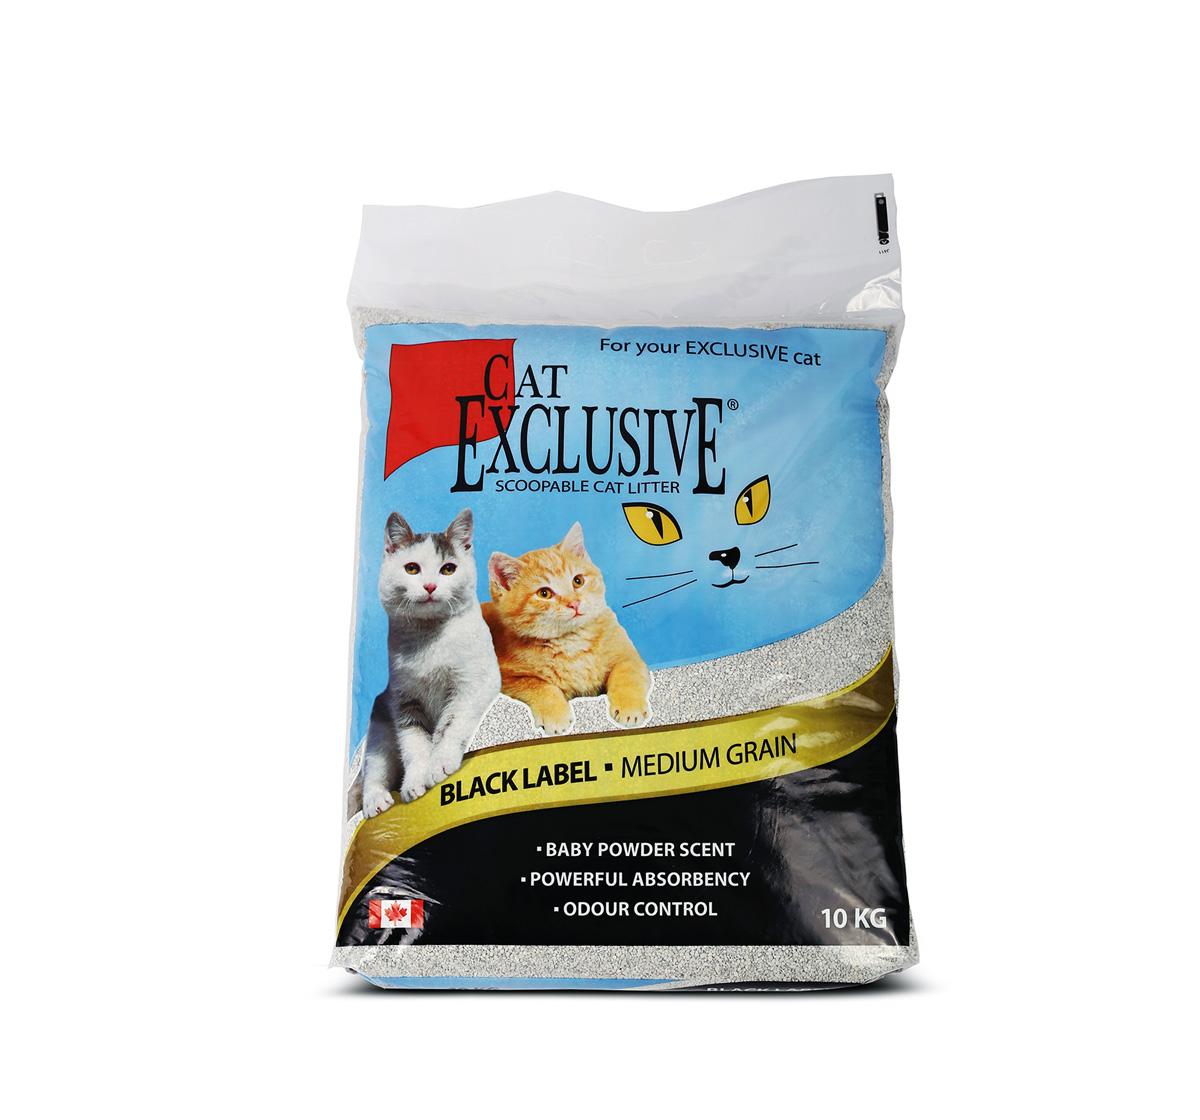 Cat Litter Exclusive -10 Kg